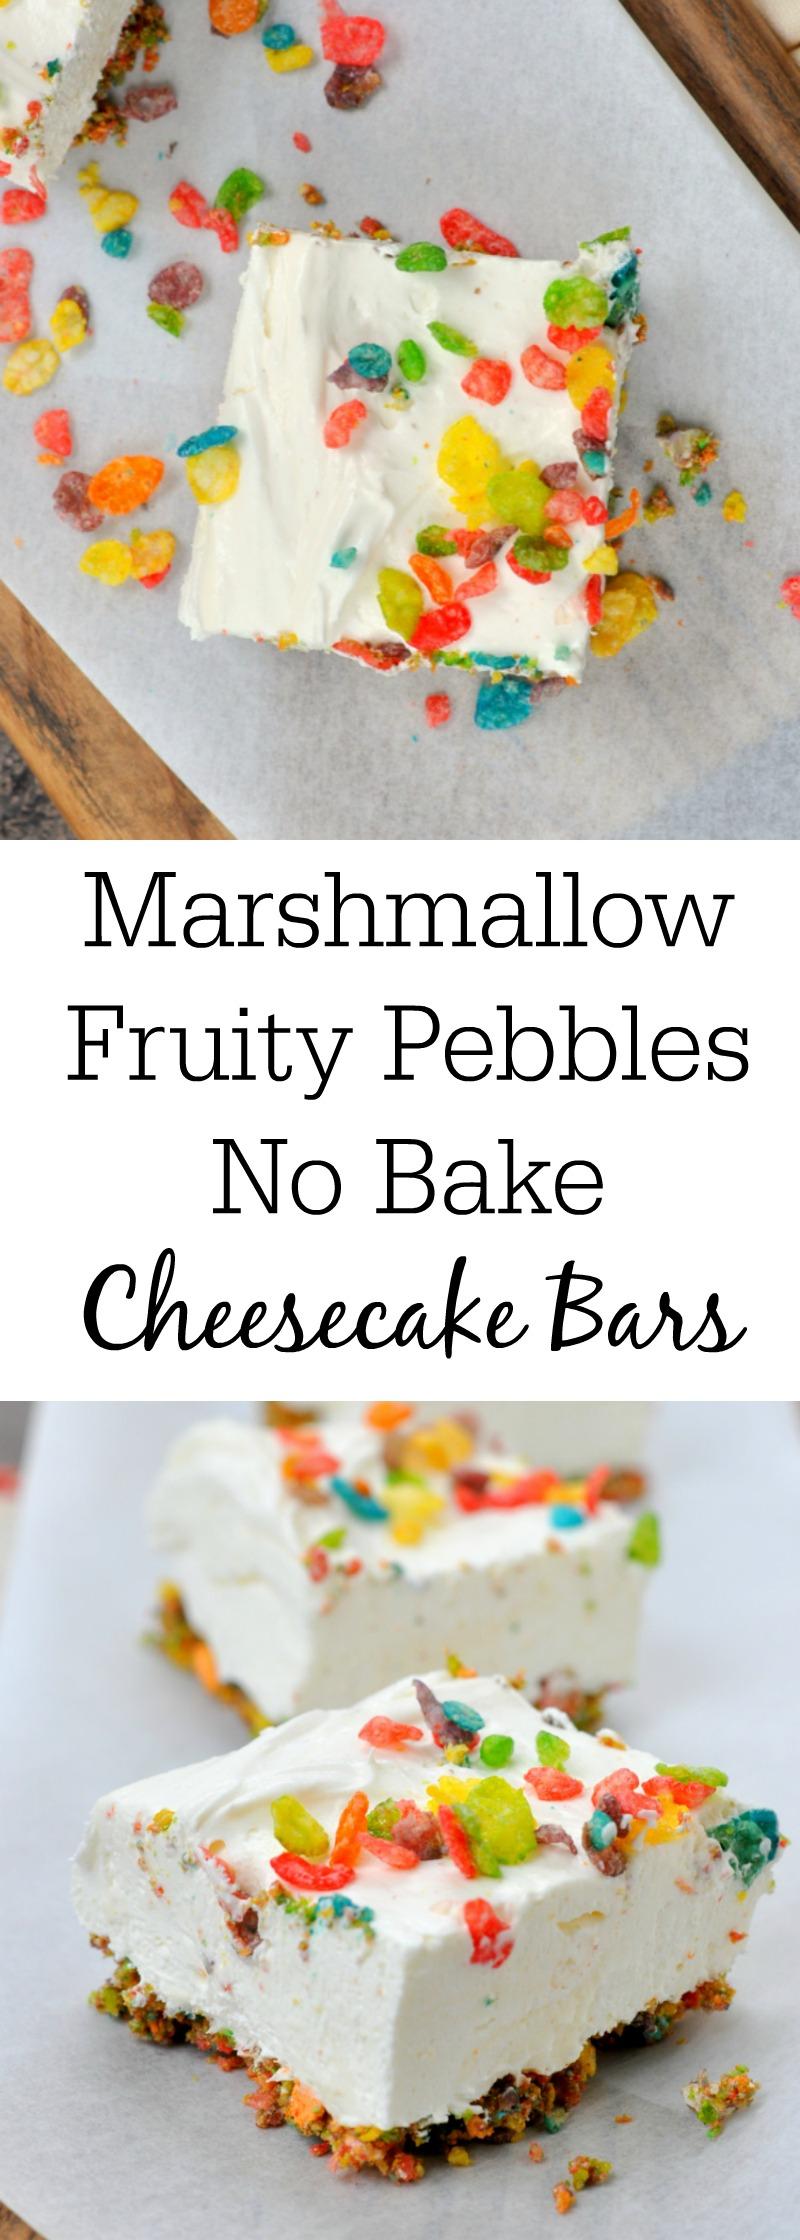 Marshmallow Fruity Pebbles No Bake Cheesecake Bars